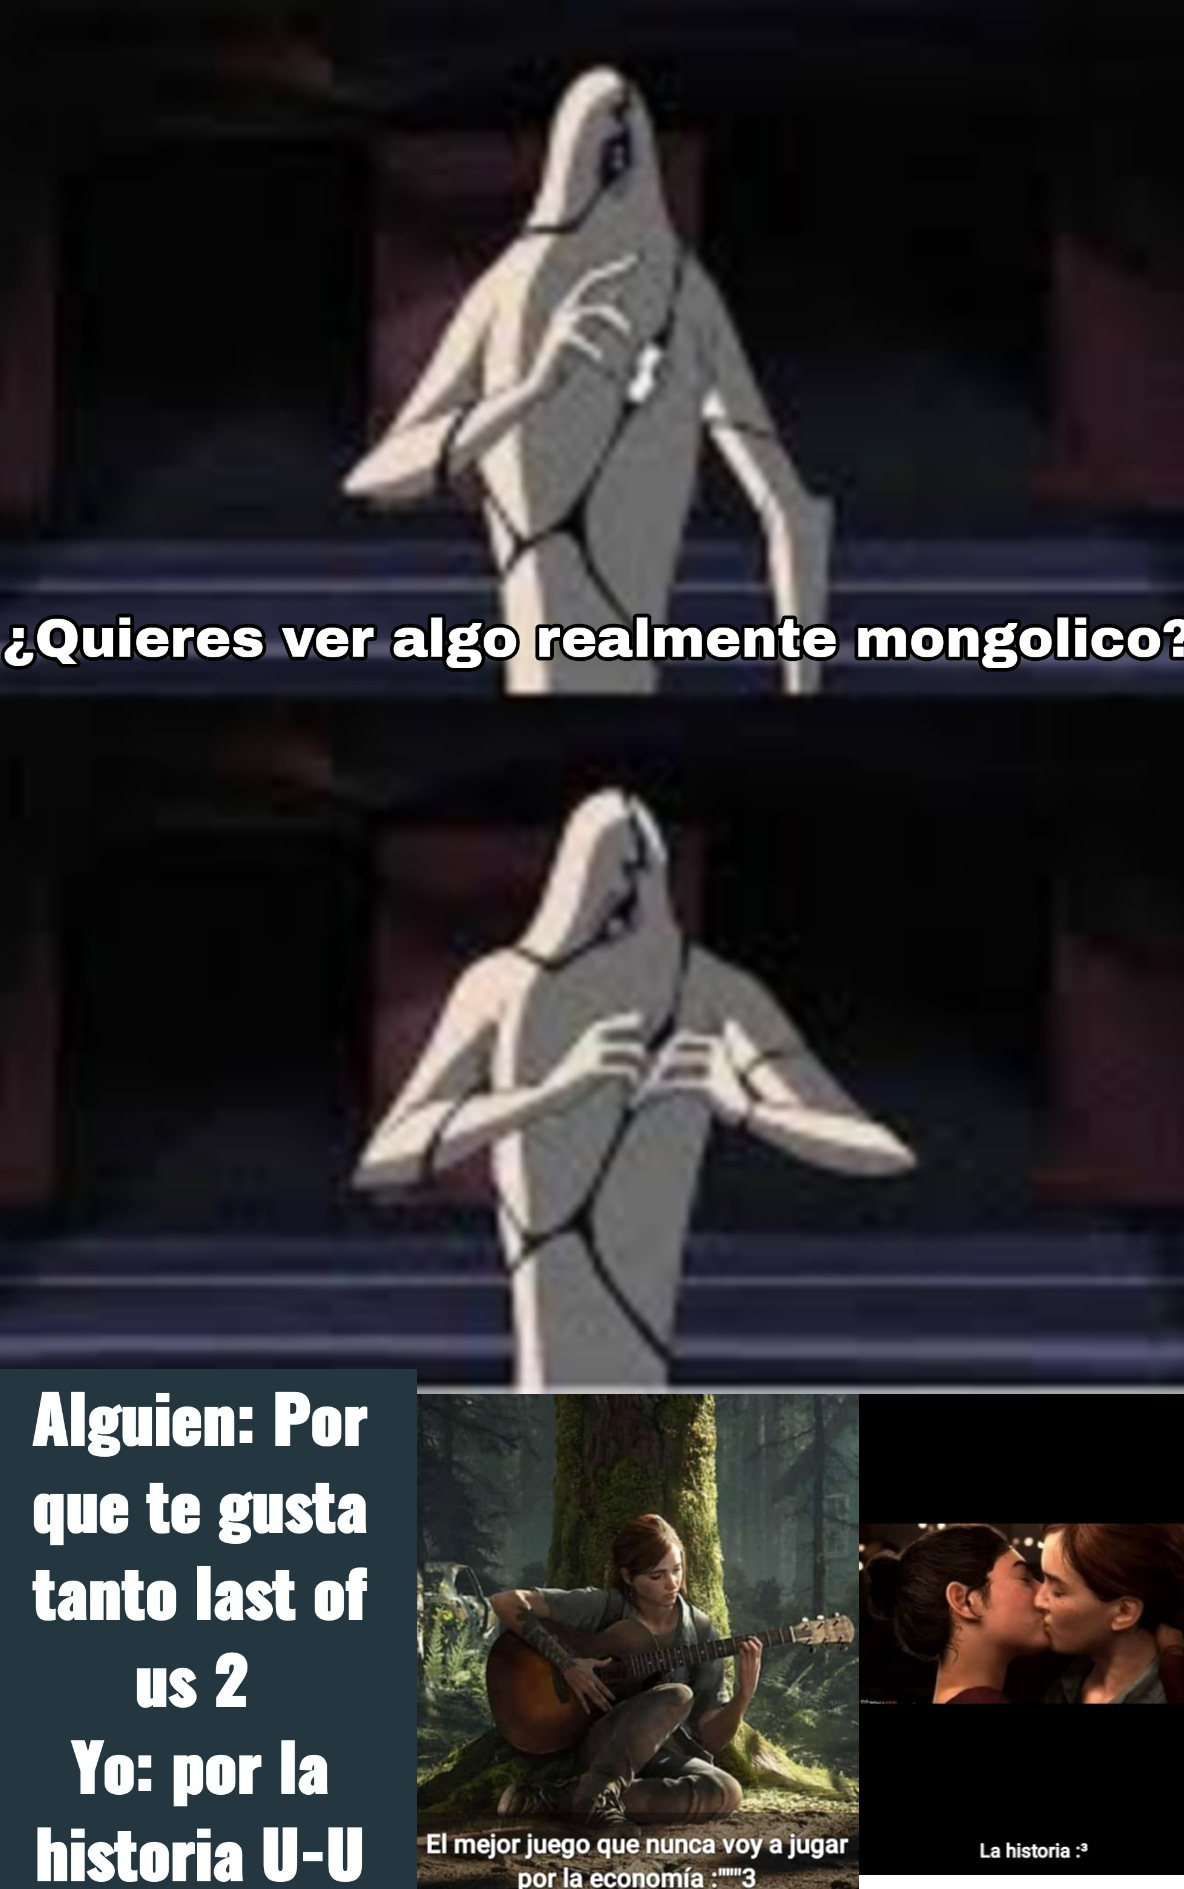 Malditos estados de watsap autistas - meme